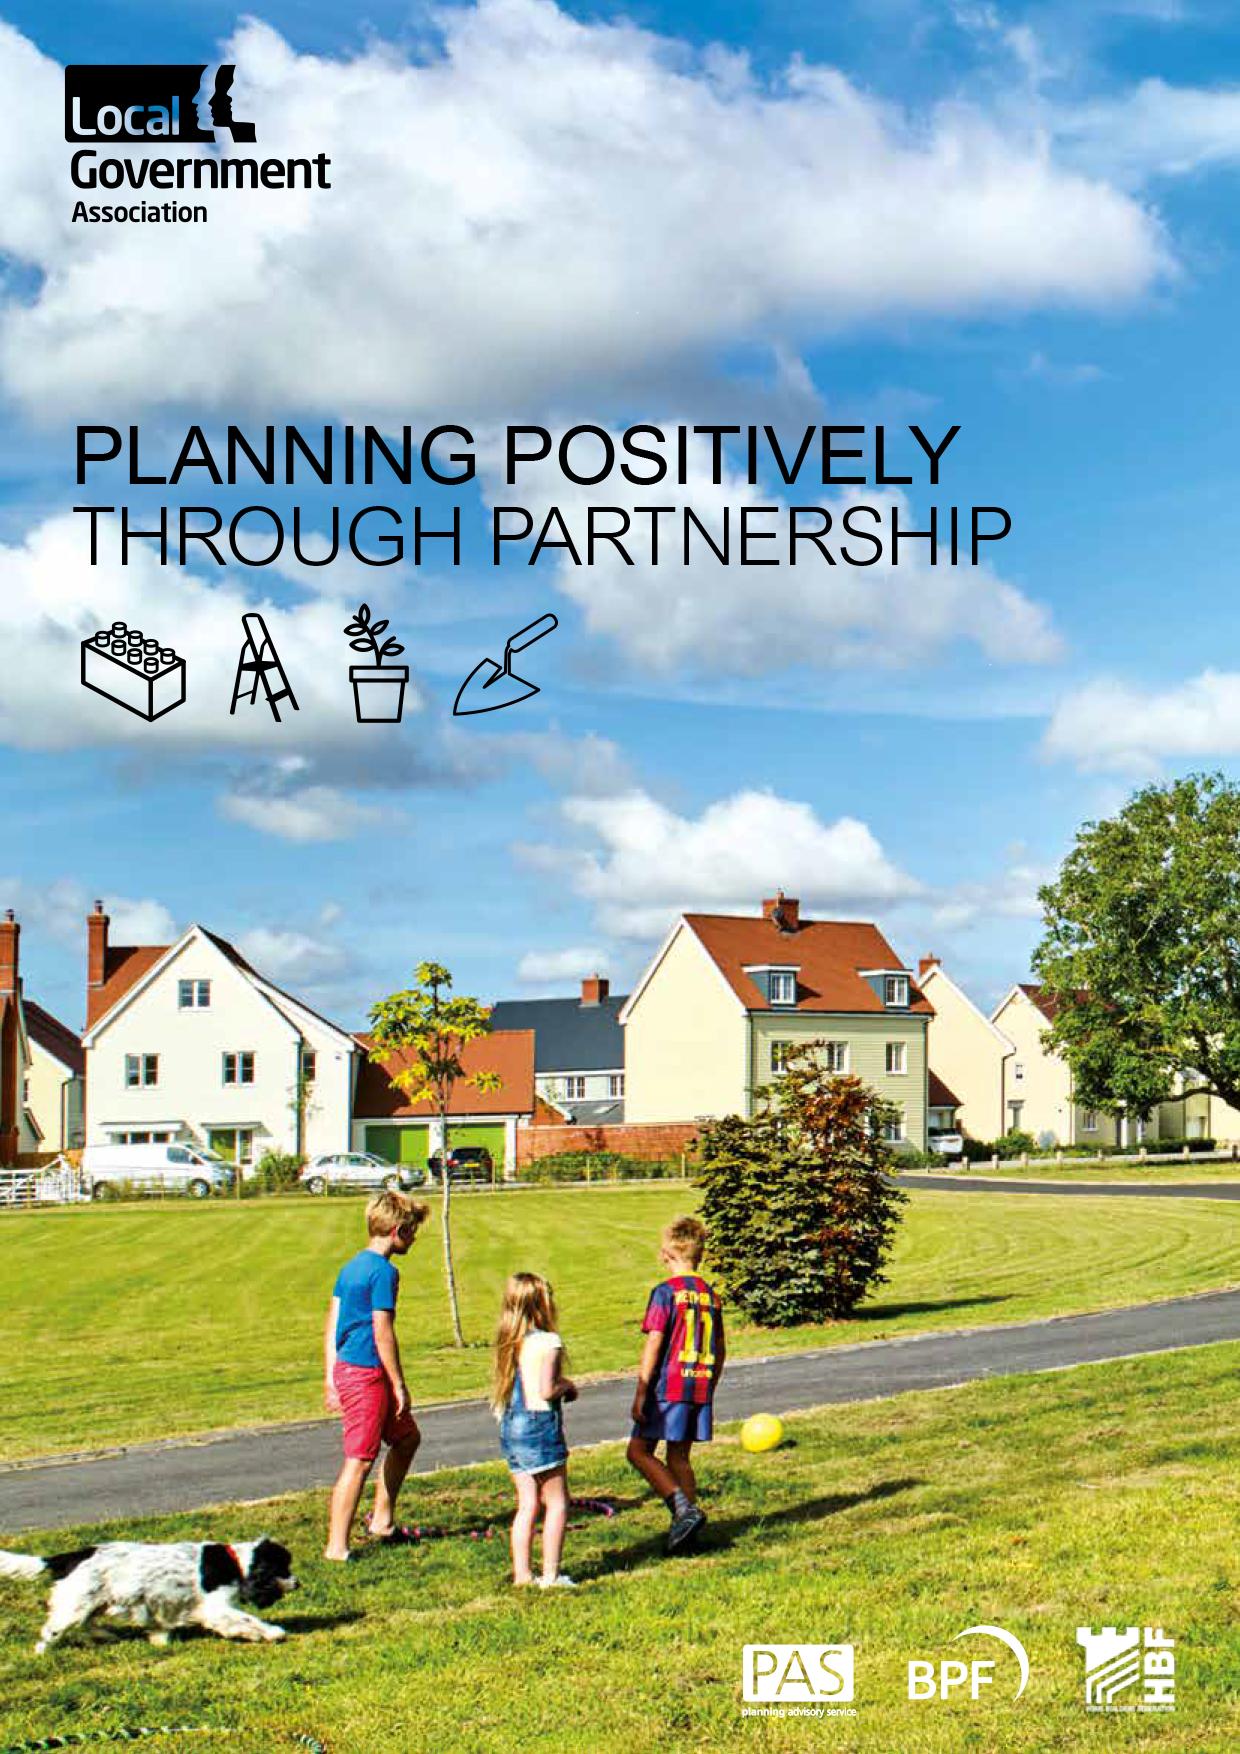 Planning positively through partnership